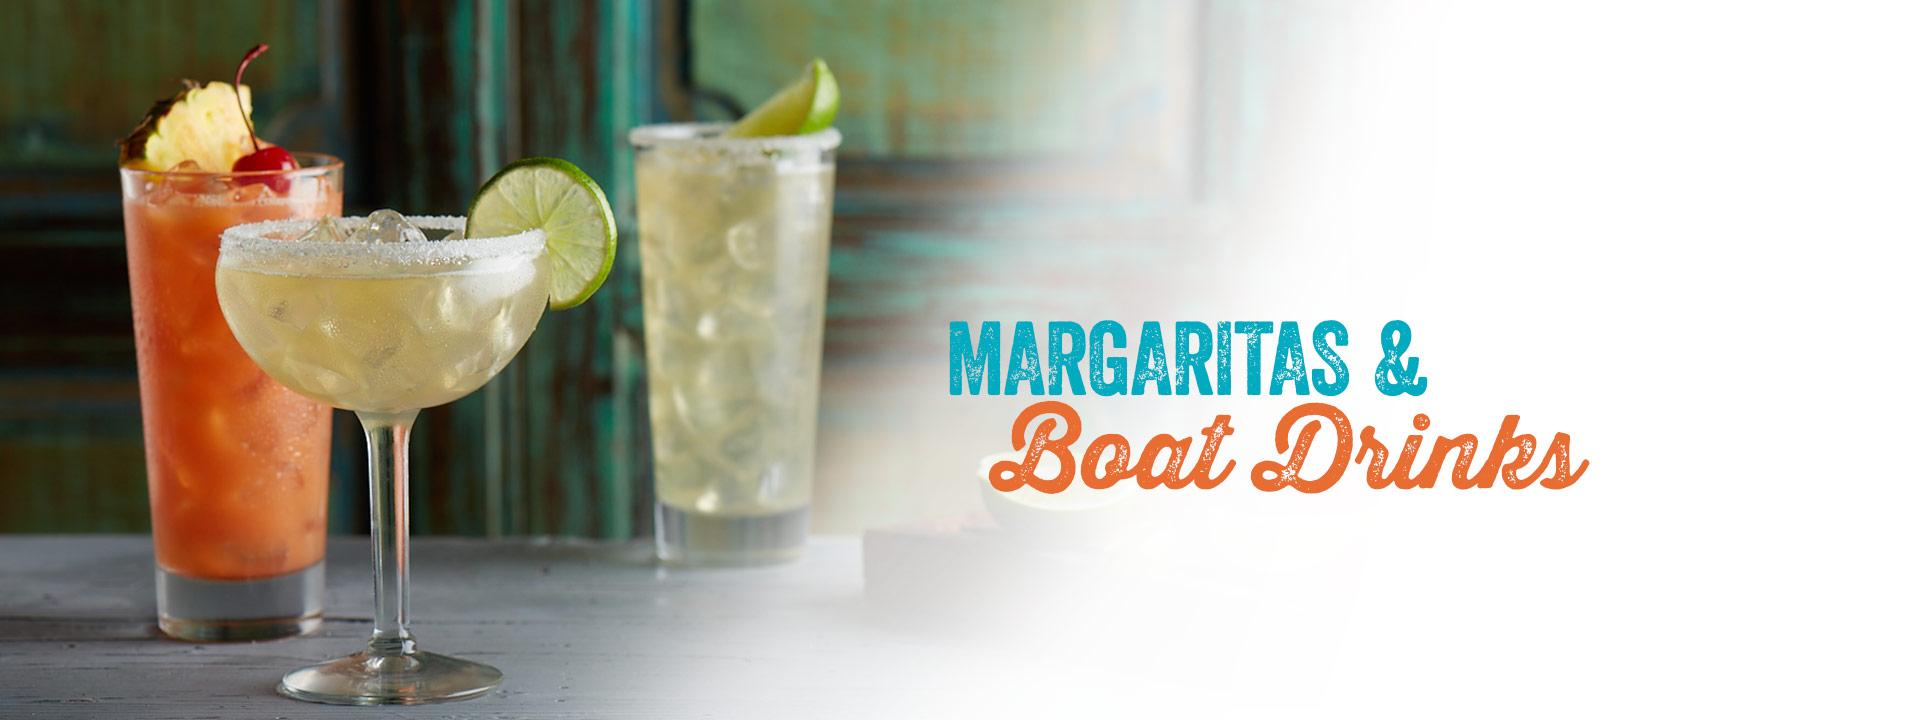 slide_margaritas_and_boat_drinks_14073_1491872789.jpg